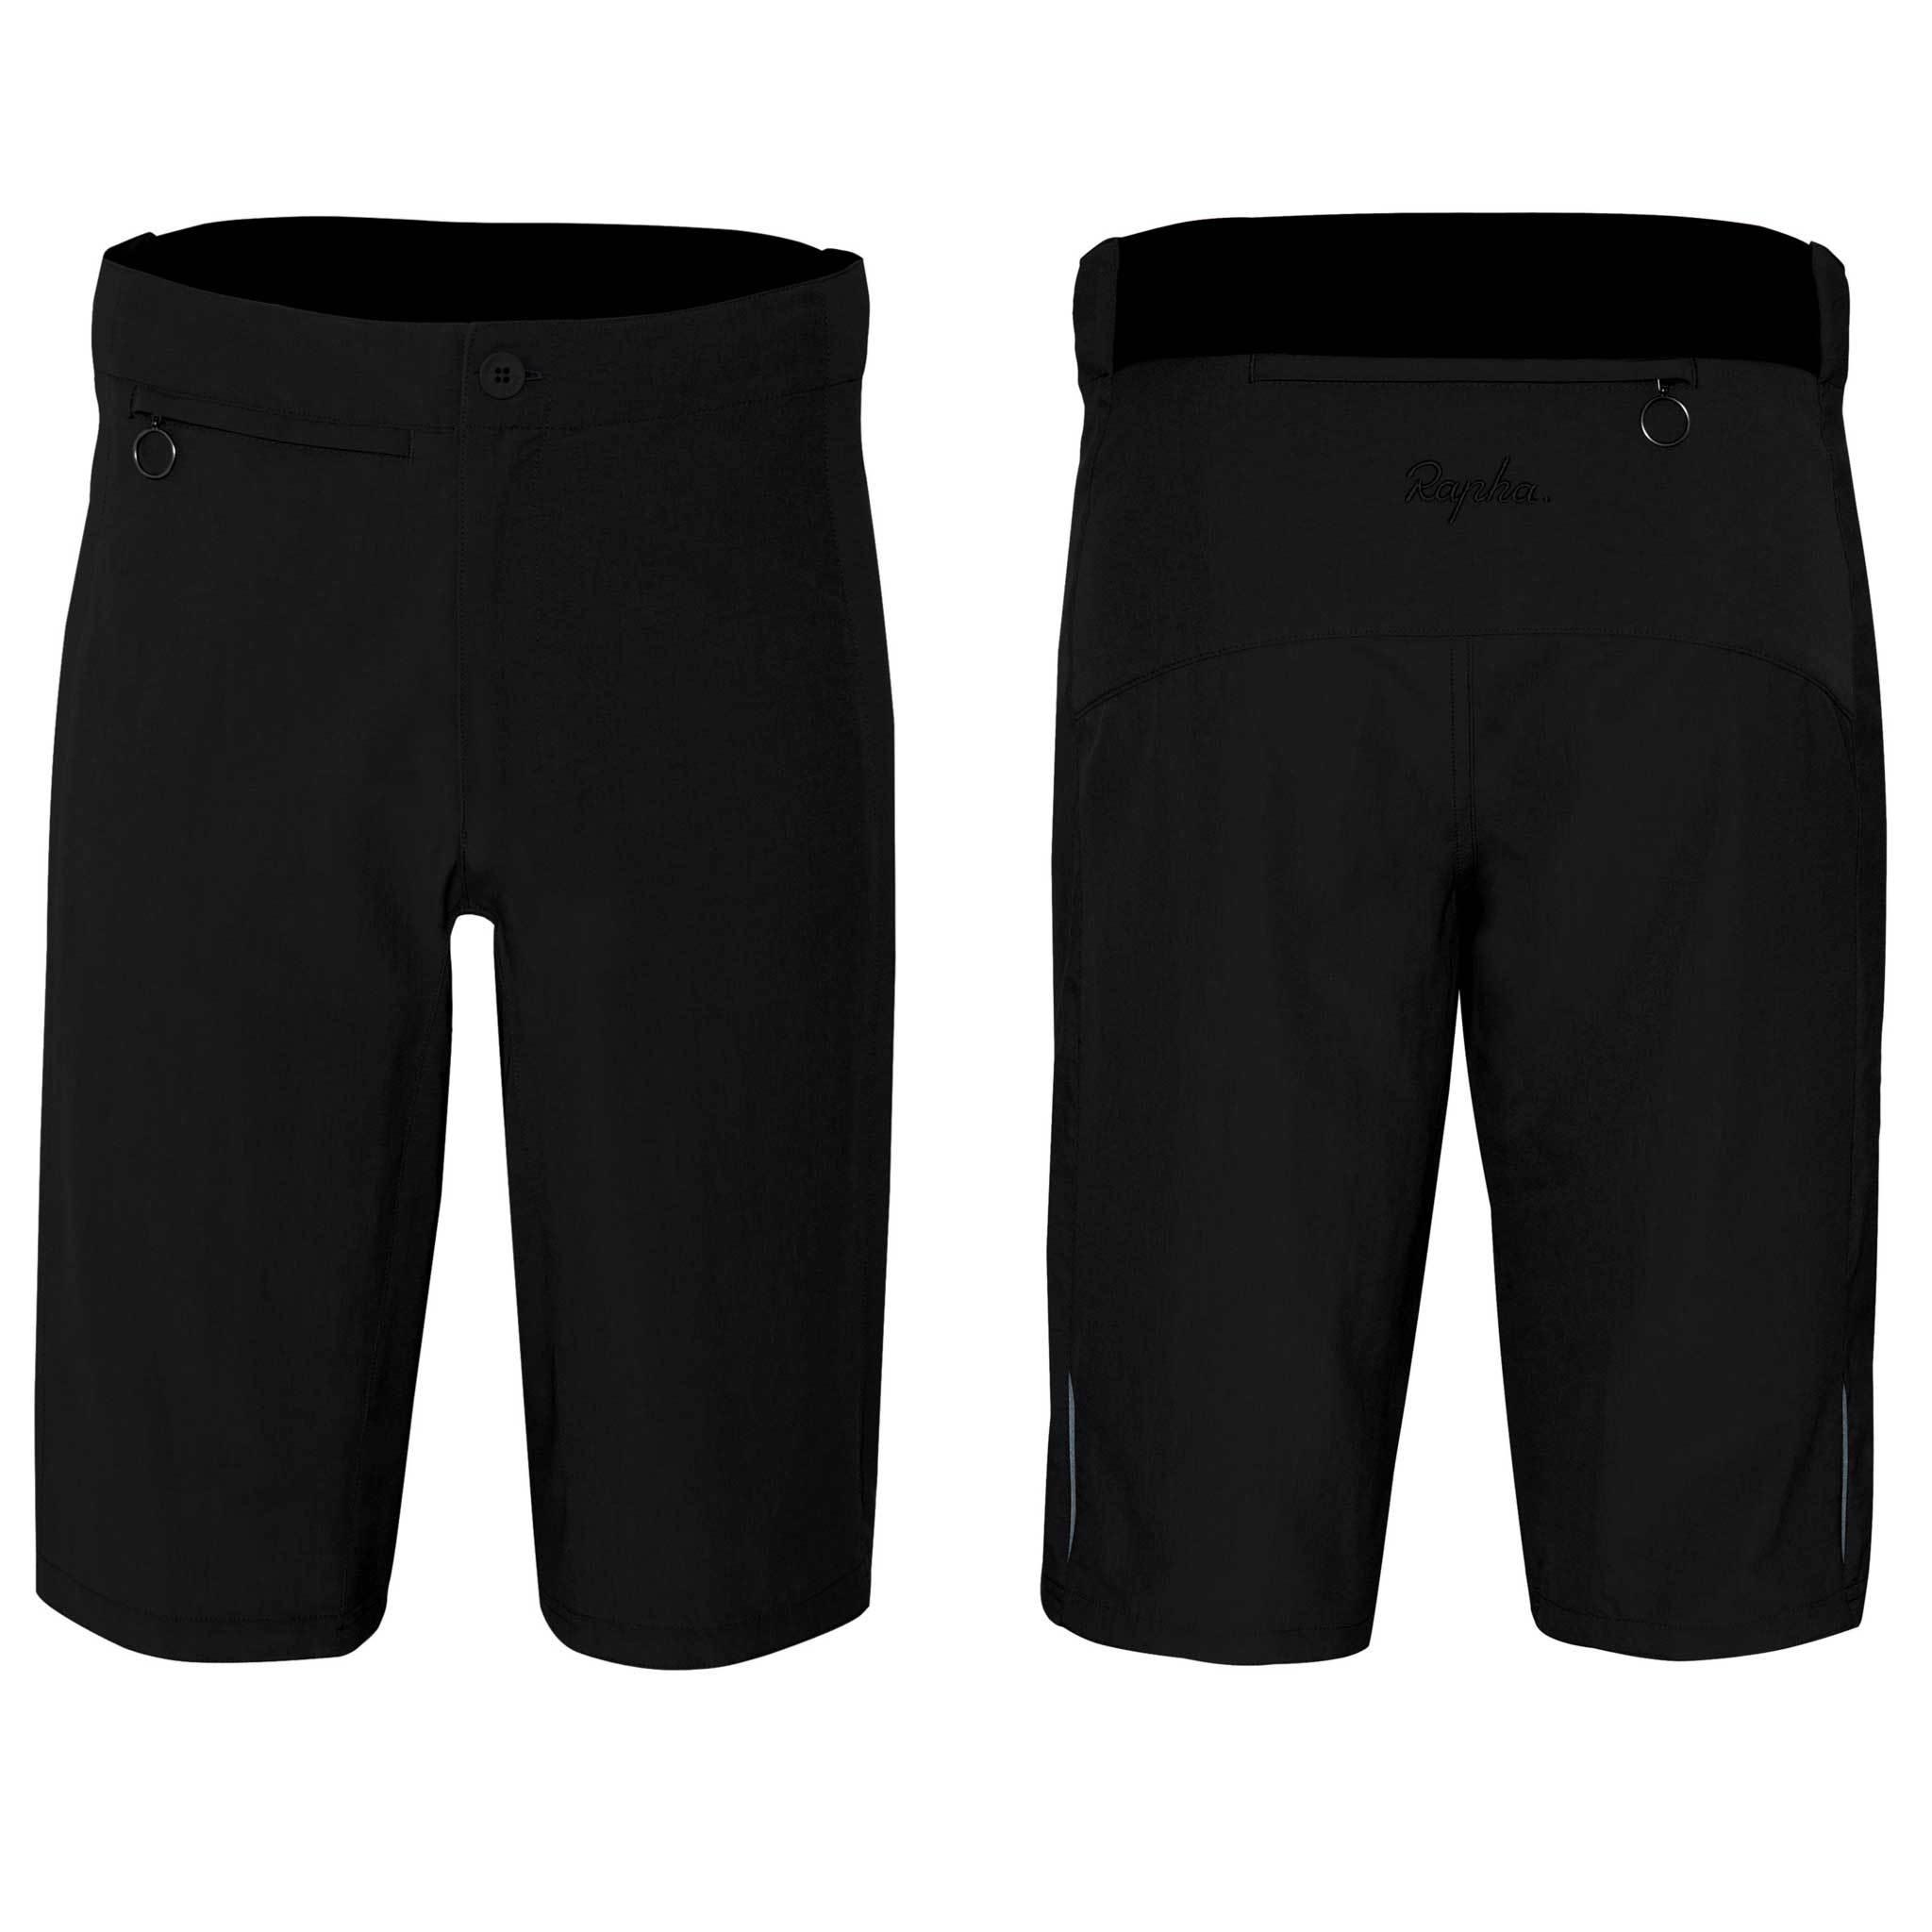 Touring Shorts